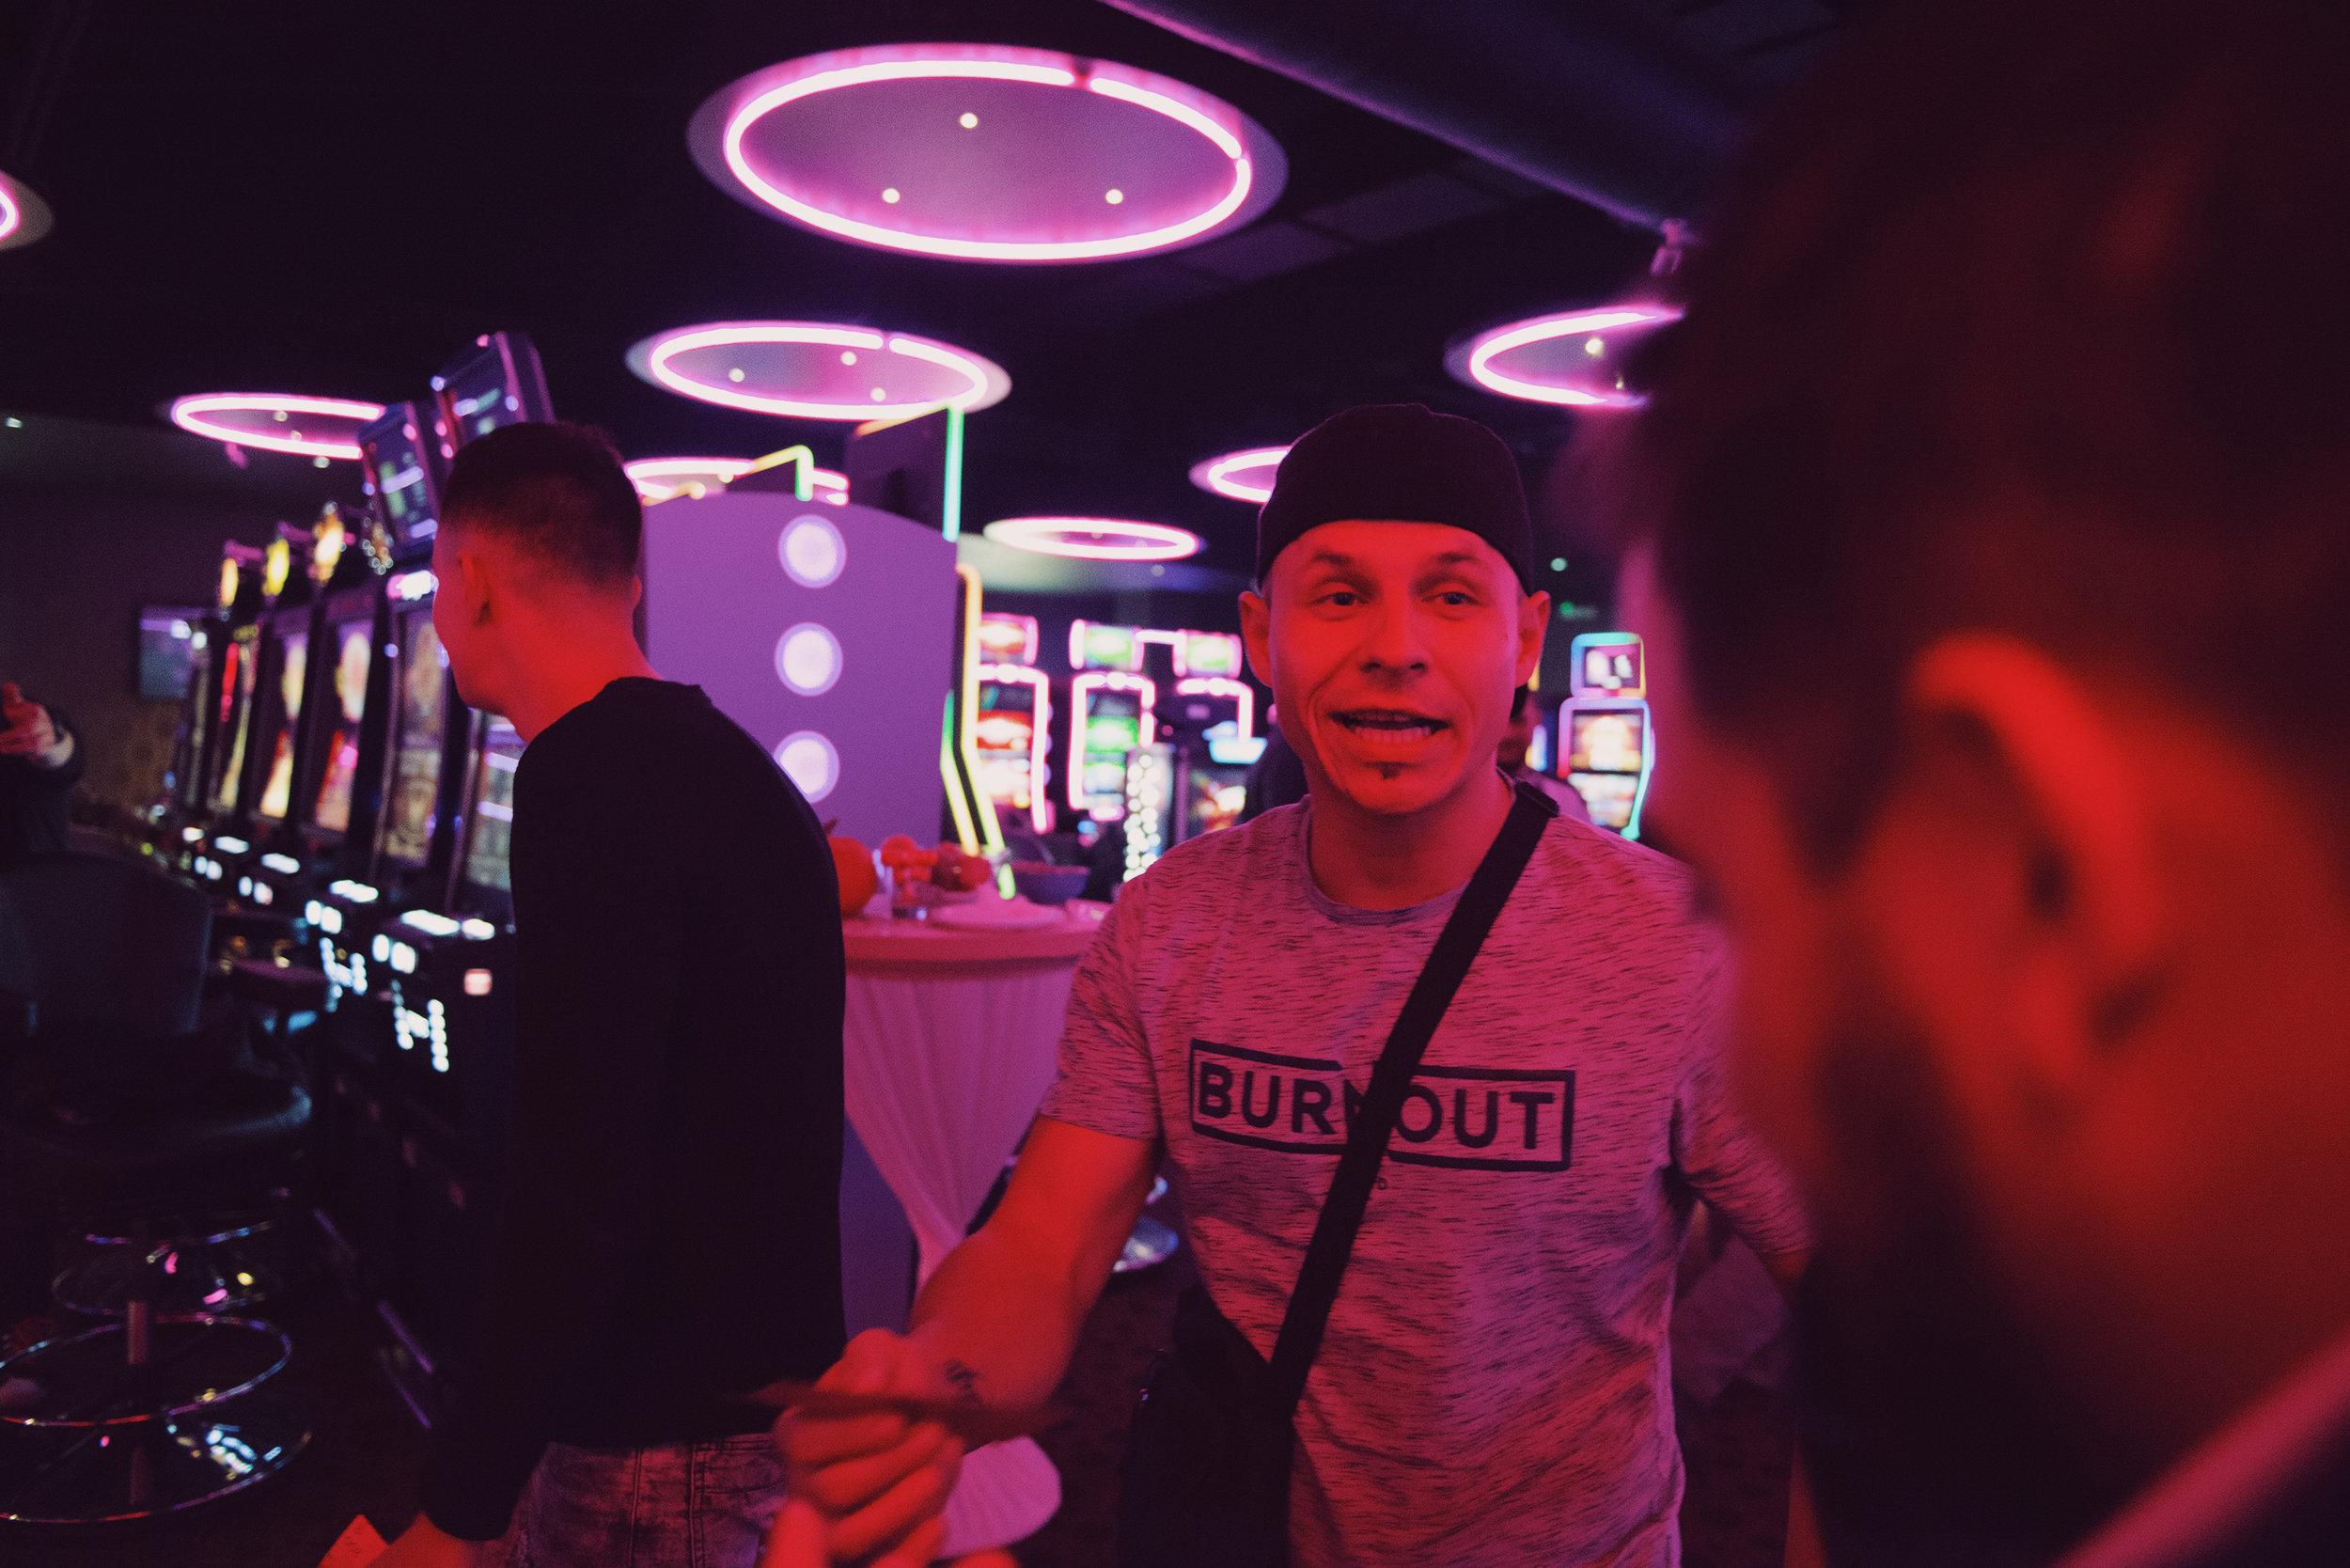 Poker-Photography-Europe-Polina-Shubkina-Casino-RebuyStars-010.JPG